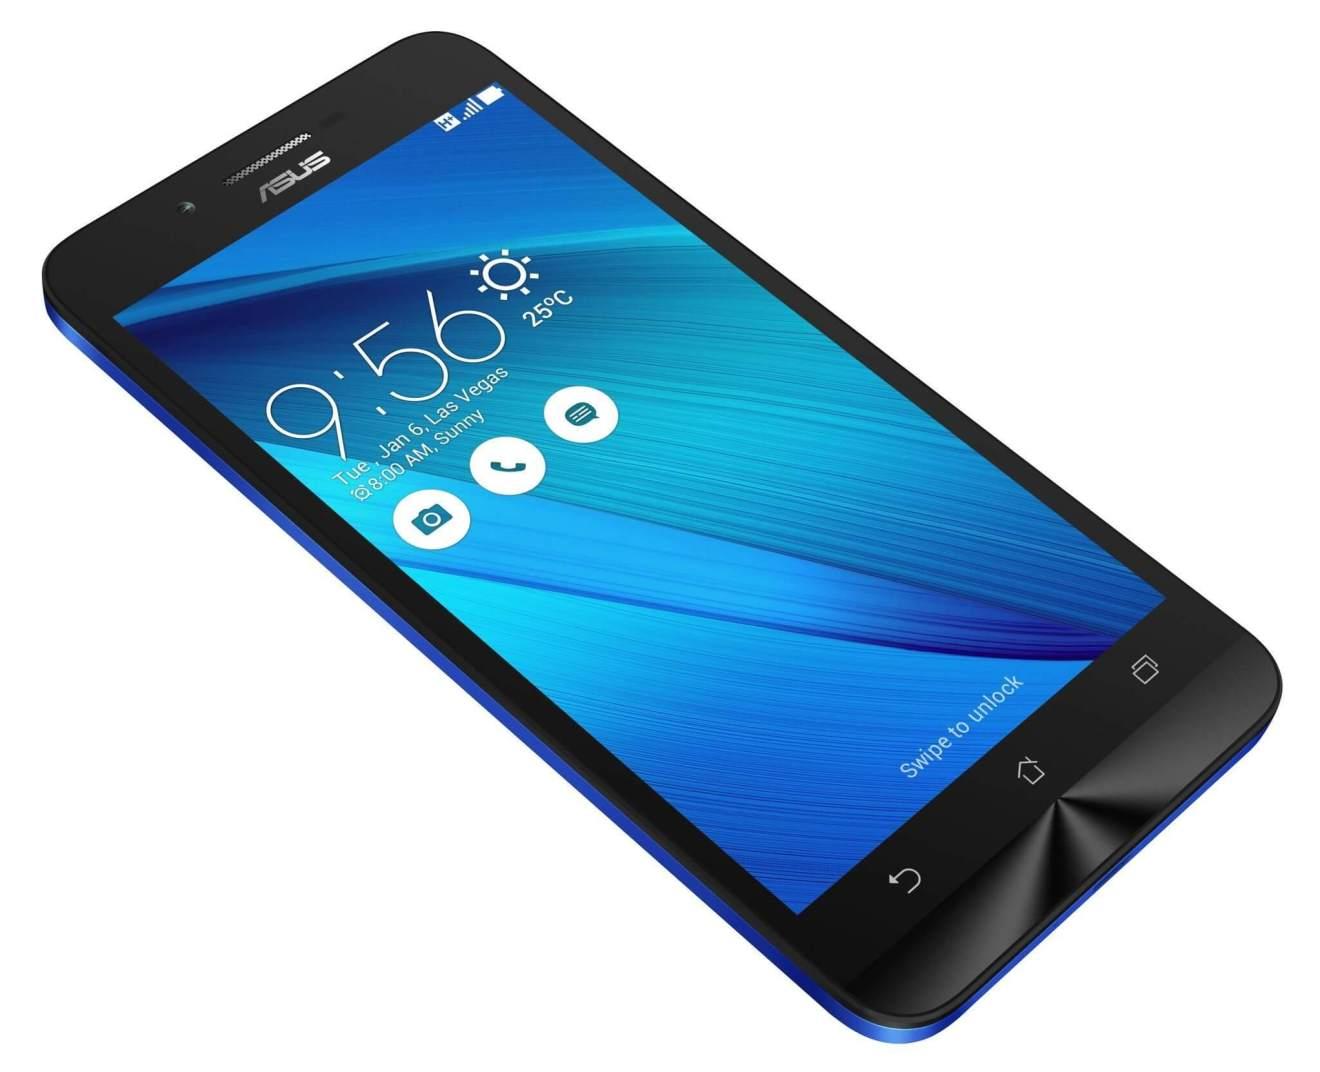 zc500tg blue  10 - Asus lança Zenfone GO, substituto do Zenfone 5